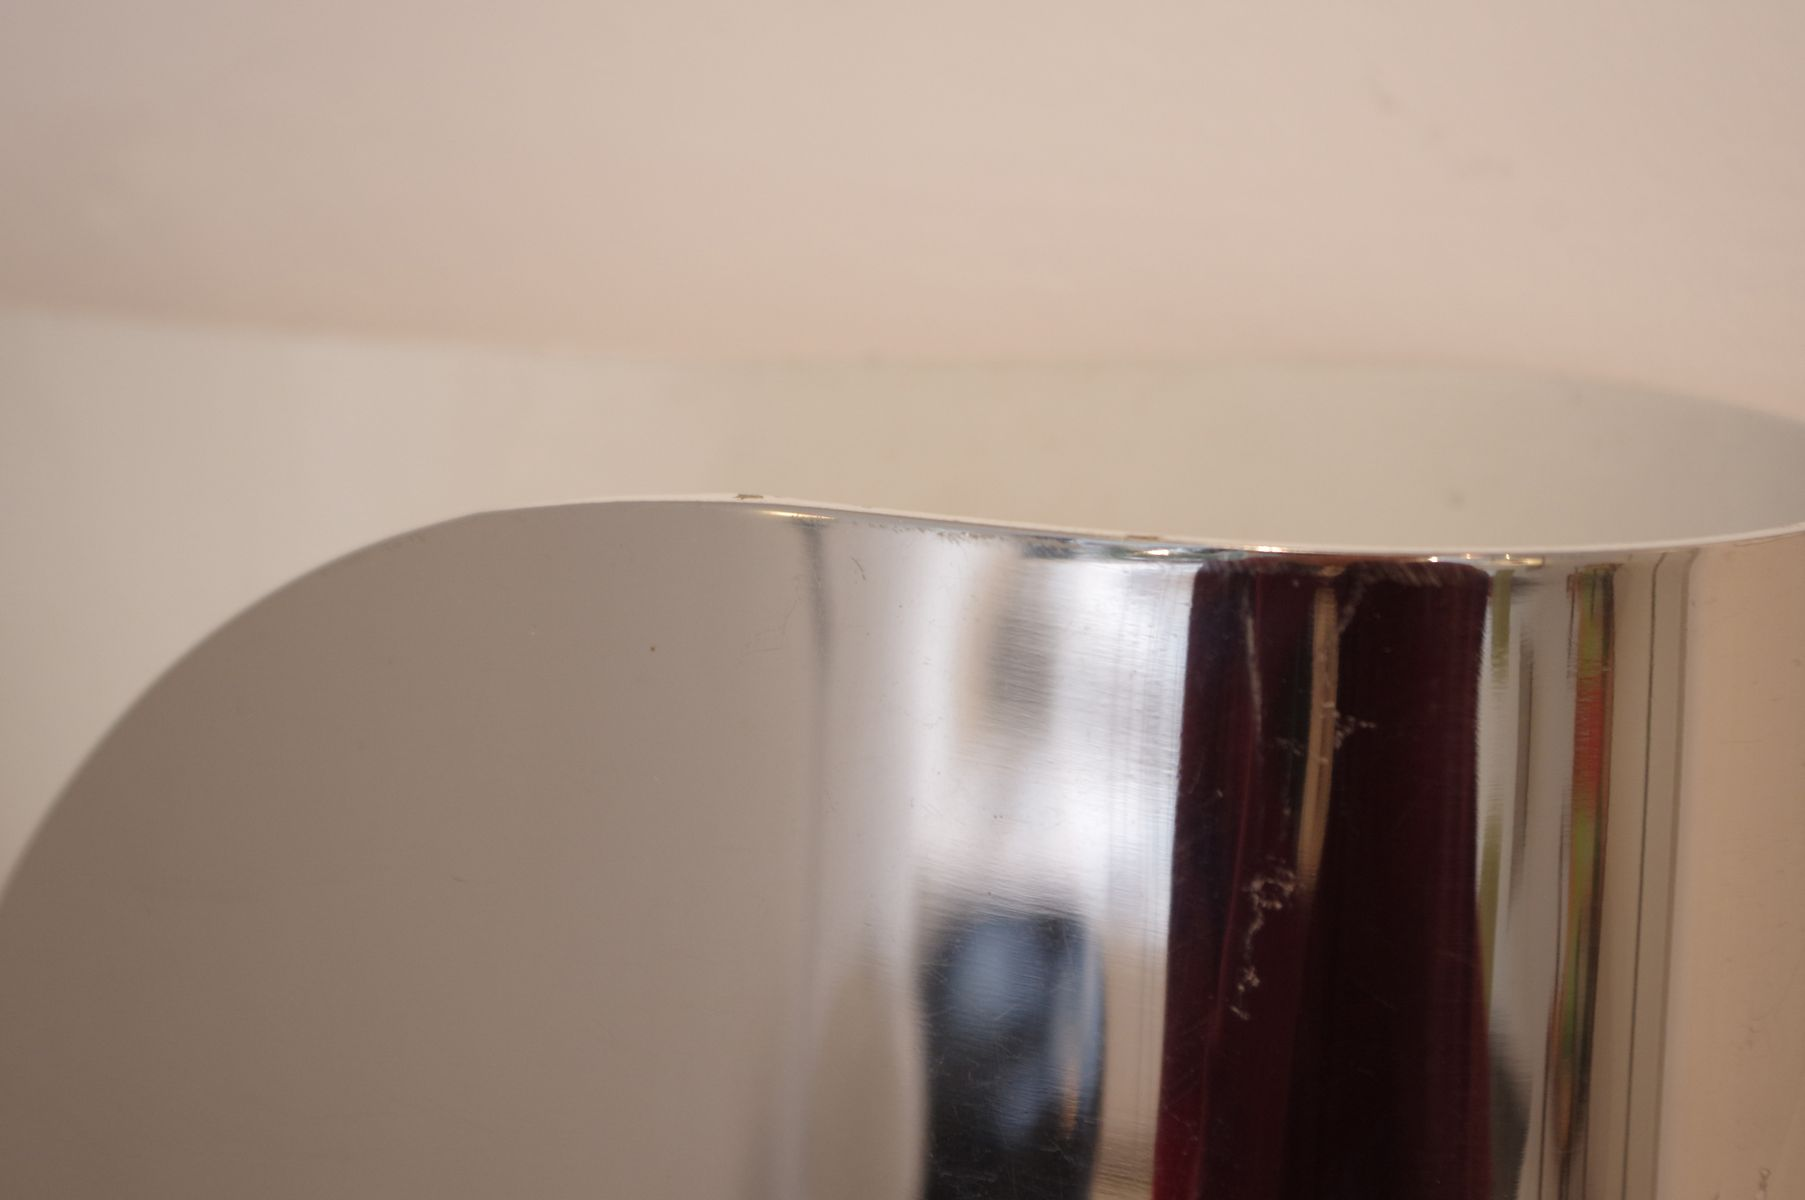 Applique flos vintage: lampe vintage perfect lampe retro bjvb